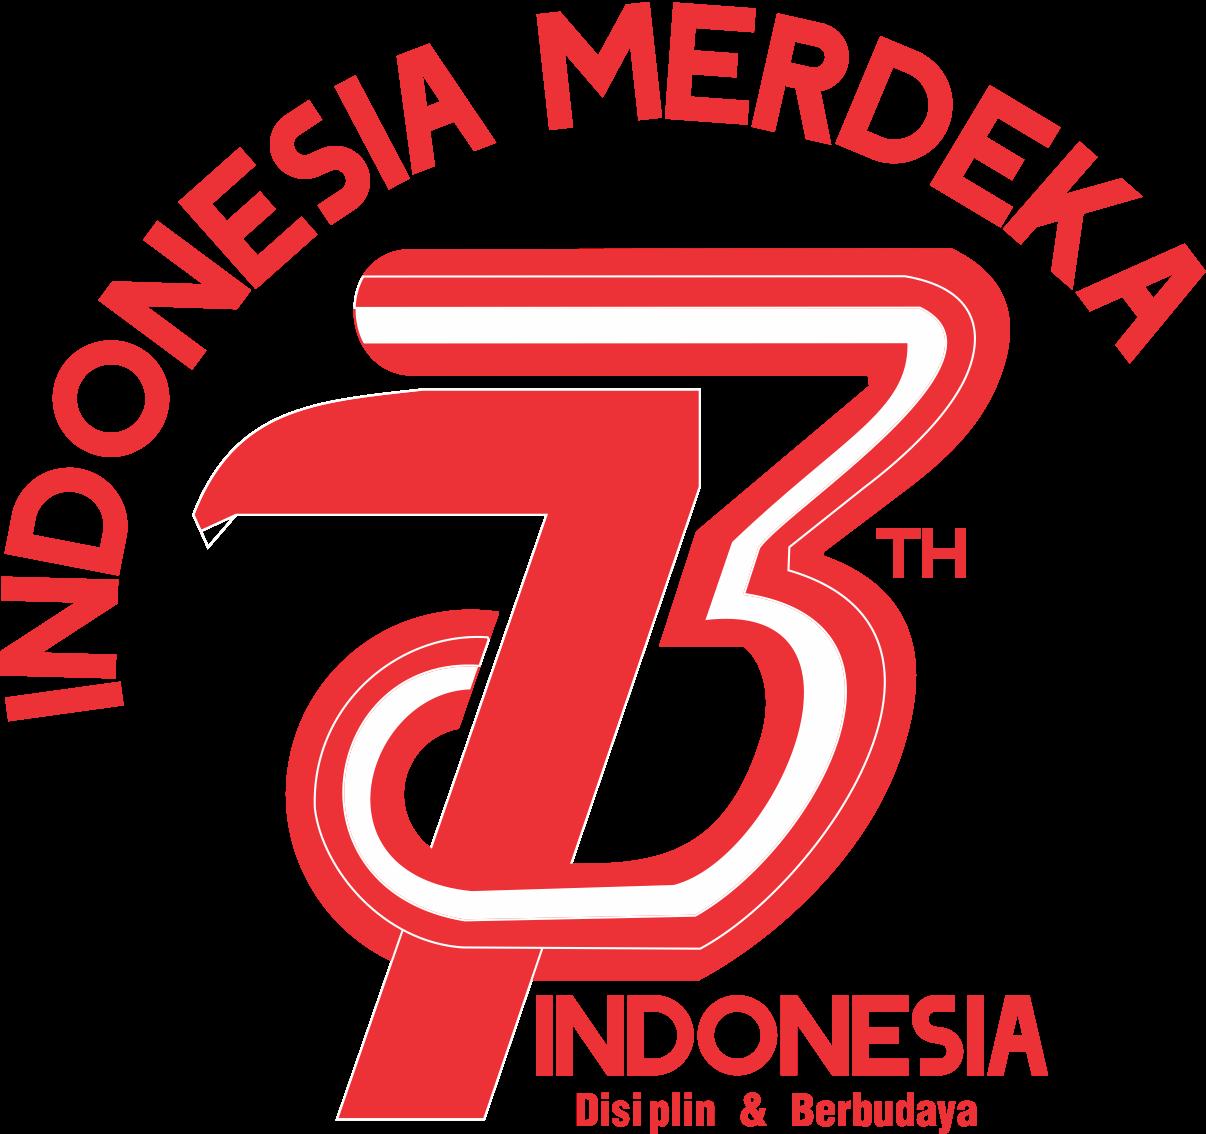 lo+73.png (1206×1134) Indonesia, Desain logo, Huruf